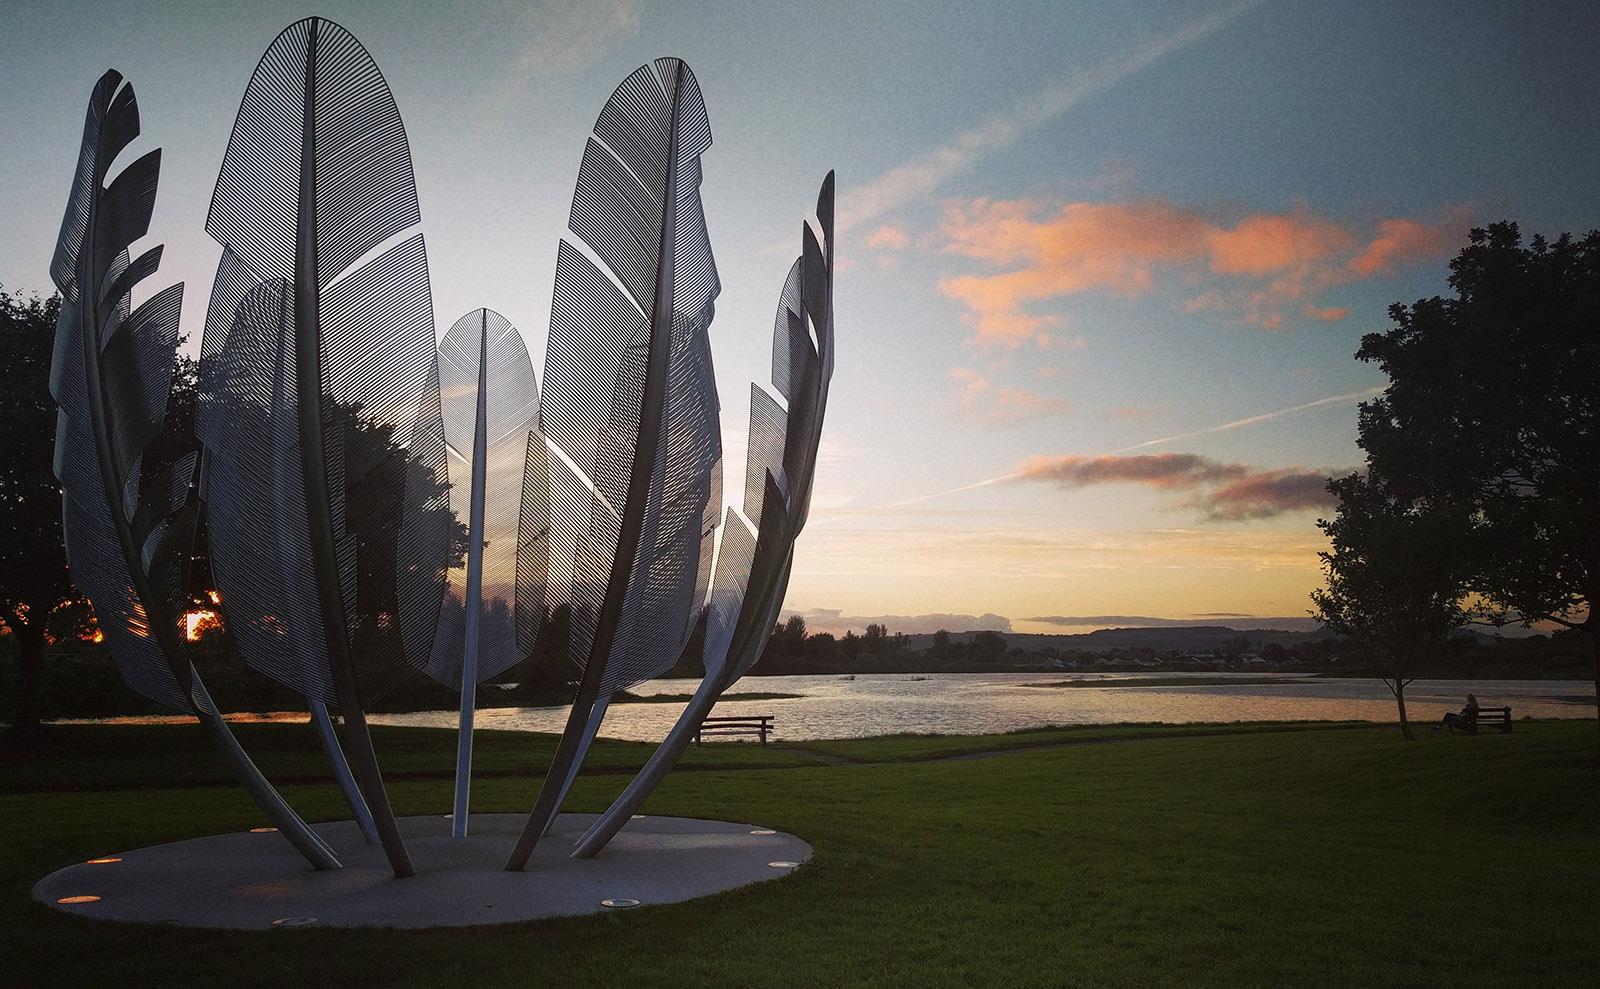 sculpture of bird feathers in east cork ireland